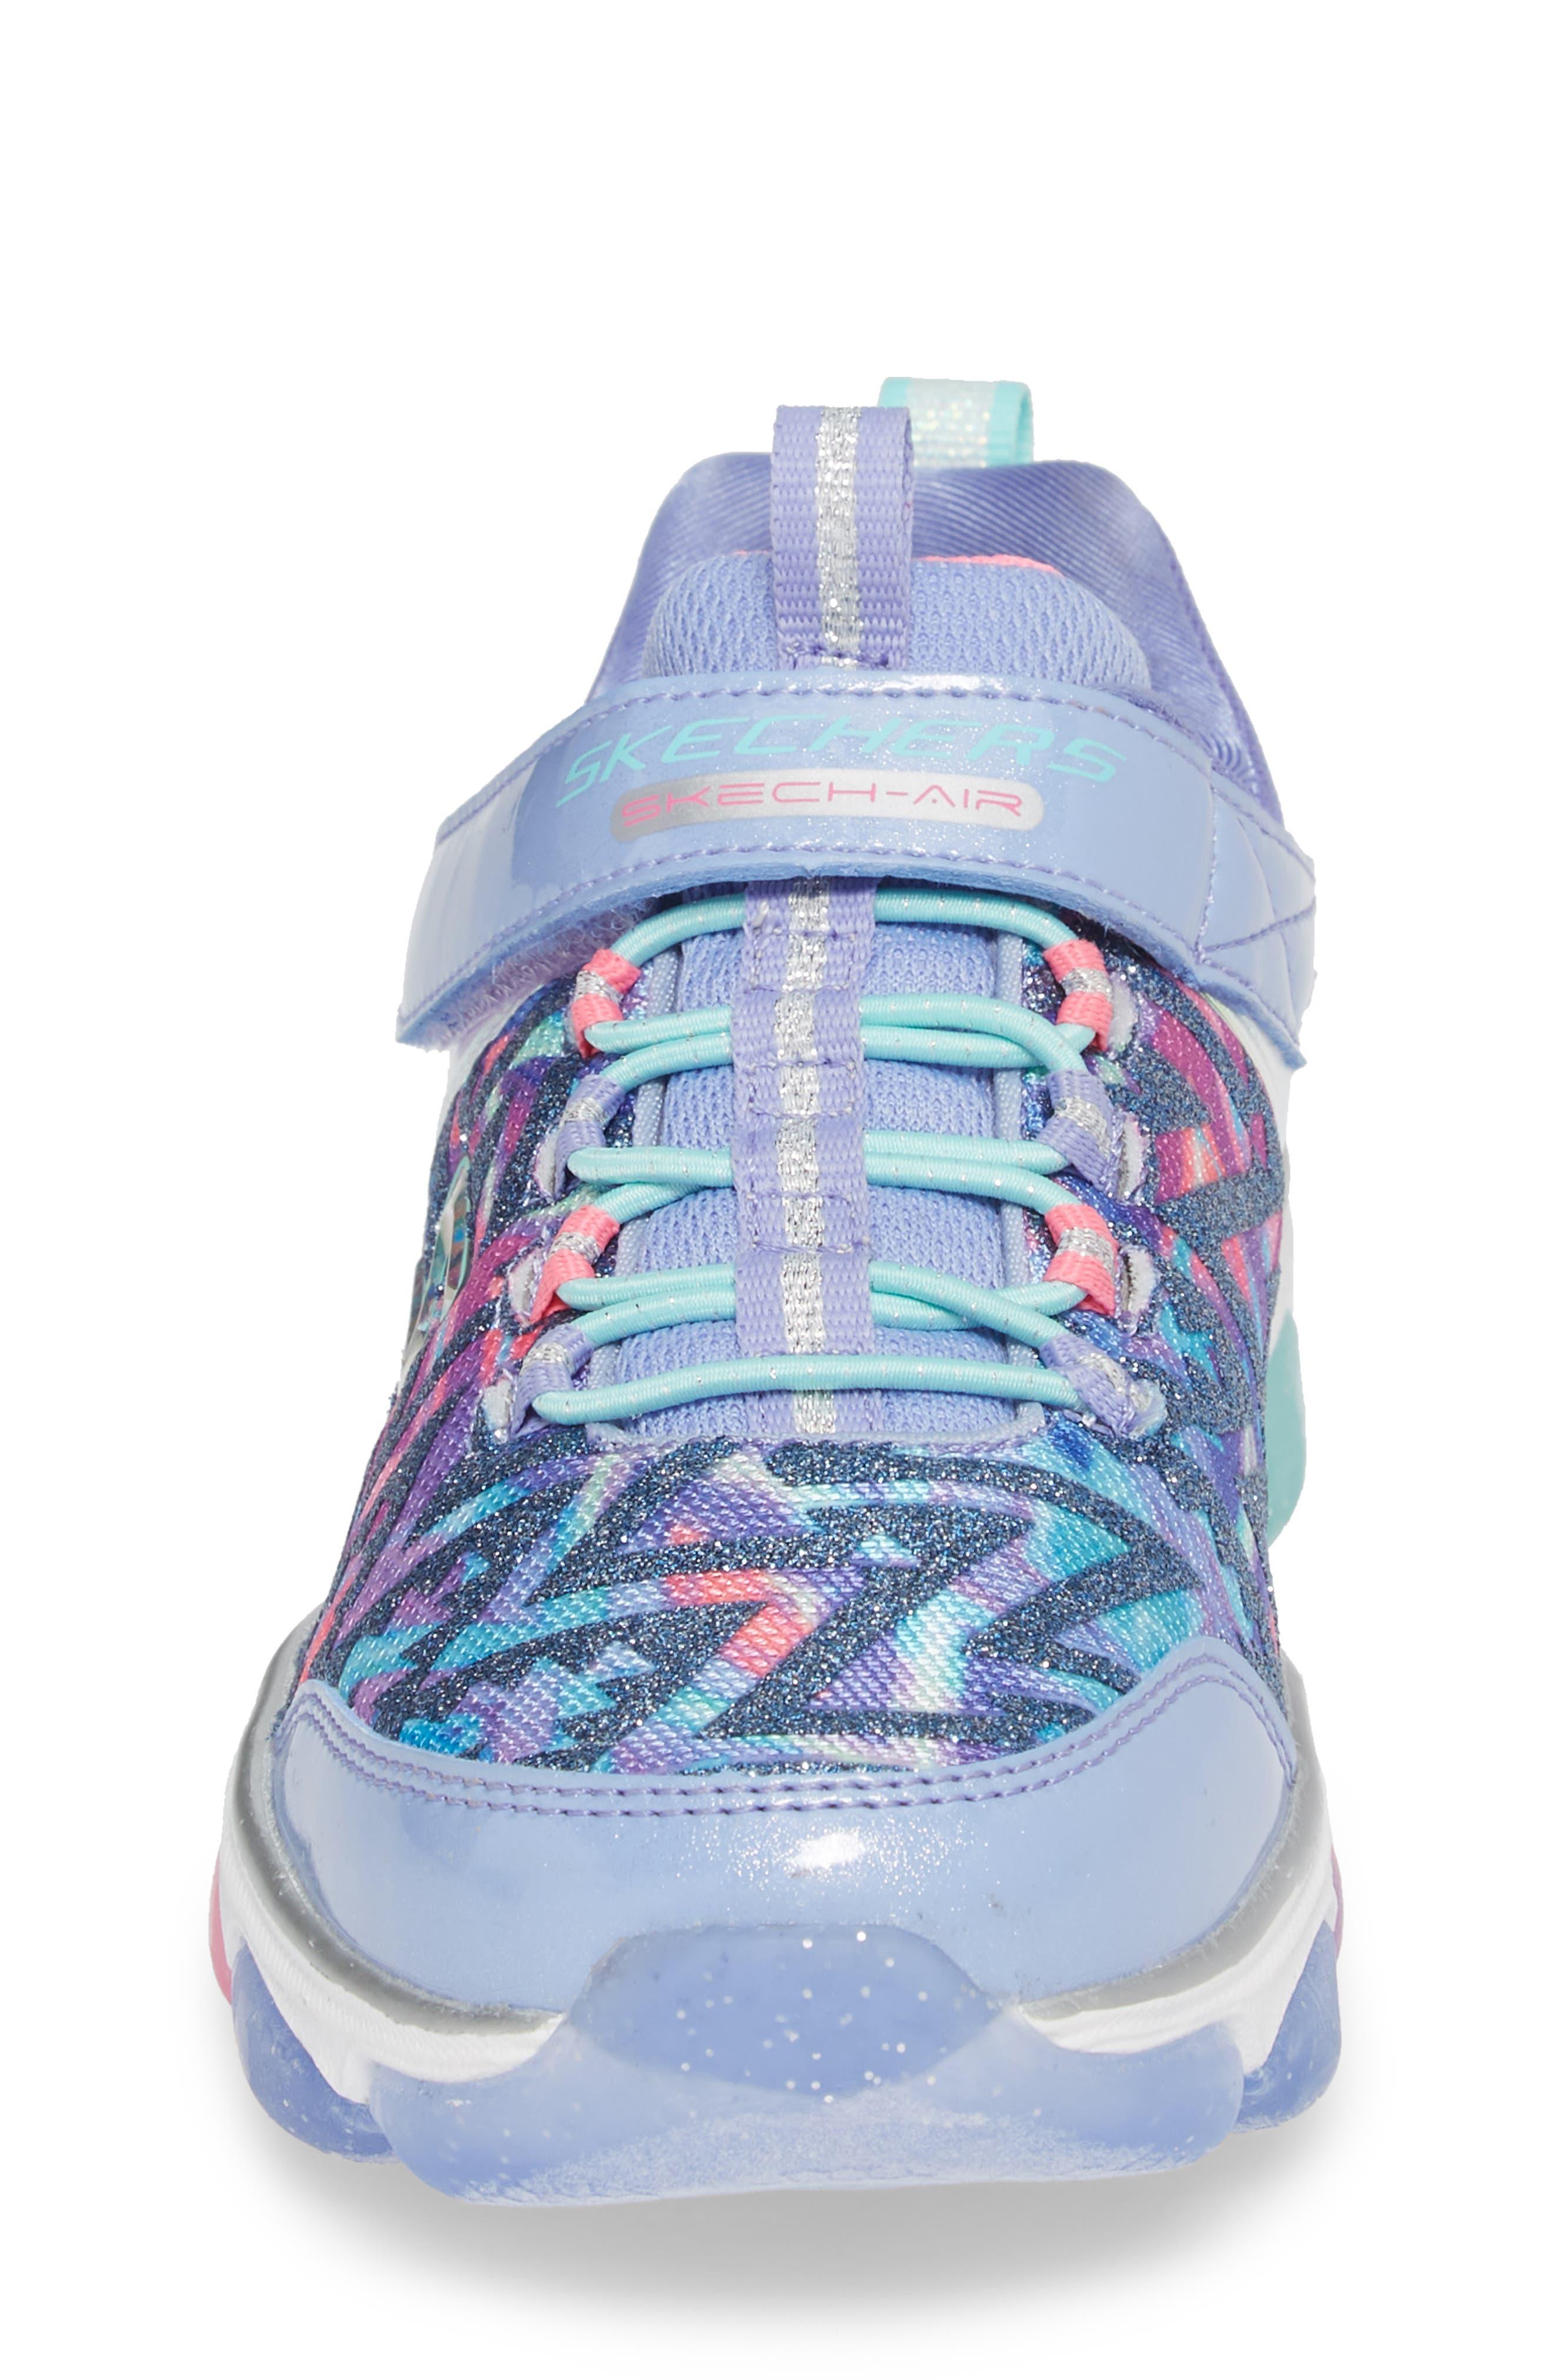 Skech-Air Groove Glitter N Go Sneakers,                             Alternate thumbnail 4, color,                             500